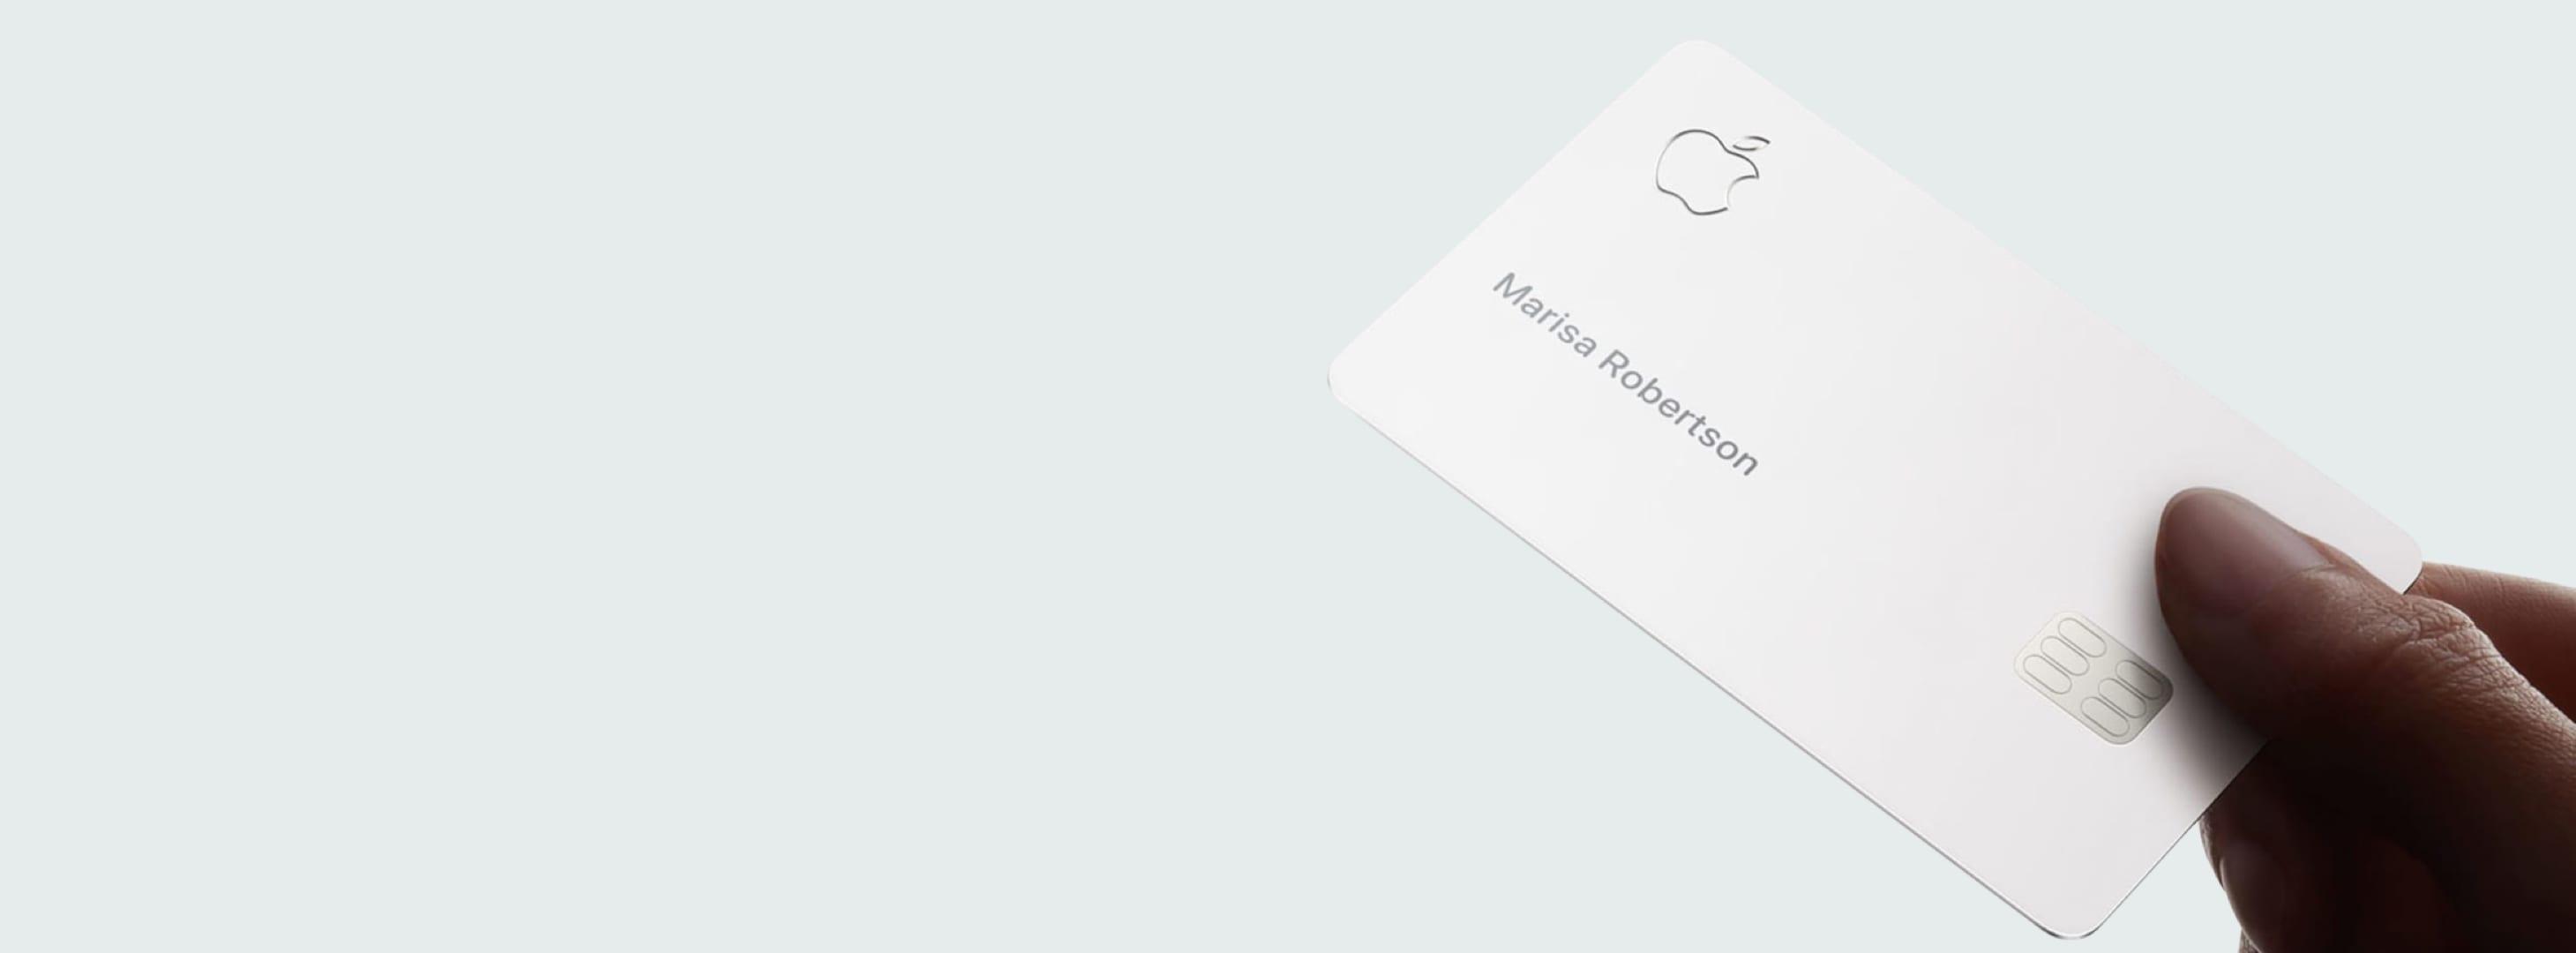 allapplenews-apple-card-in-hand